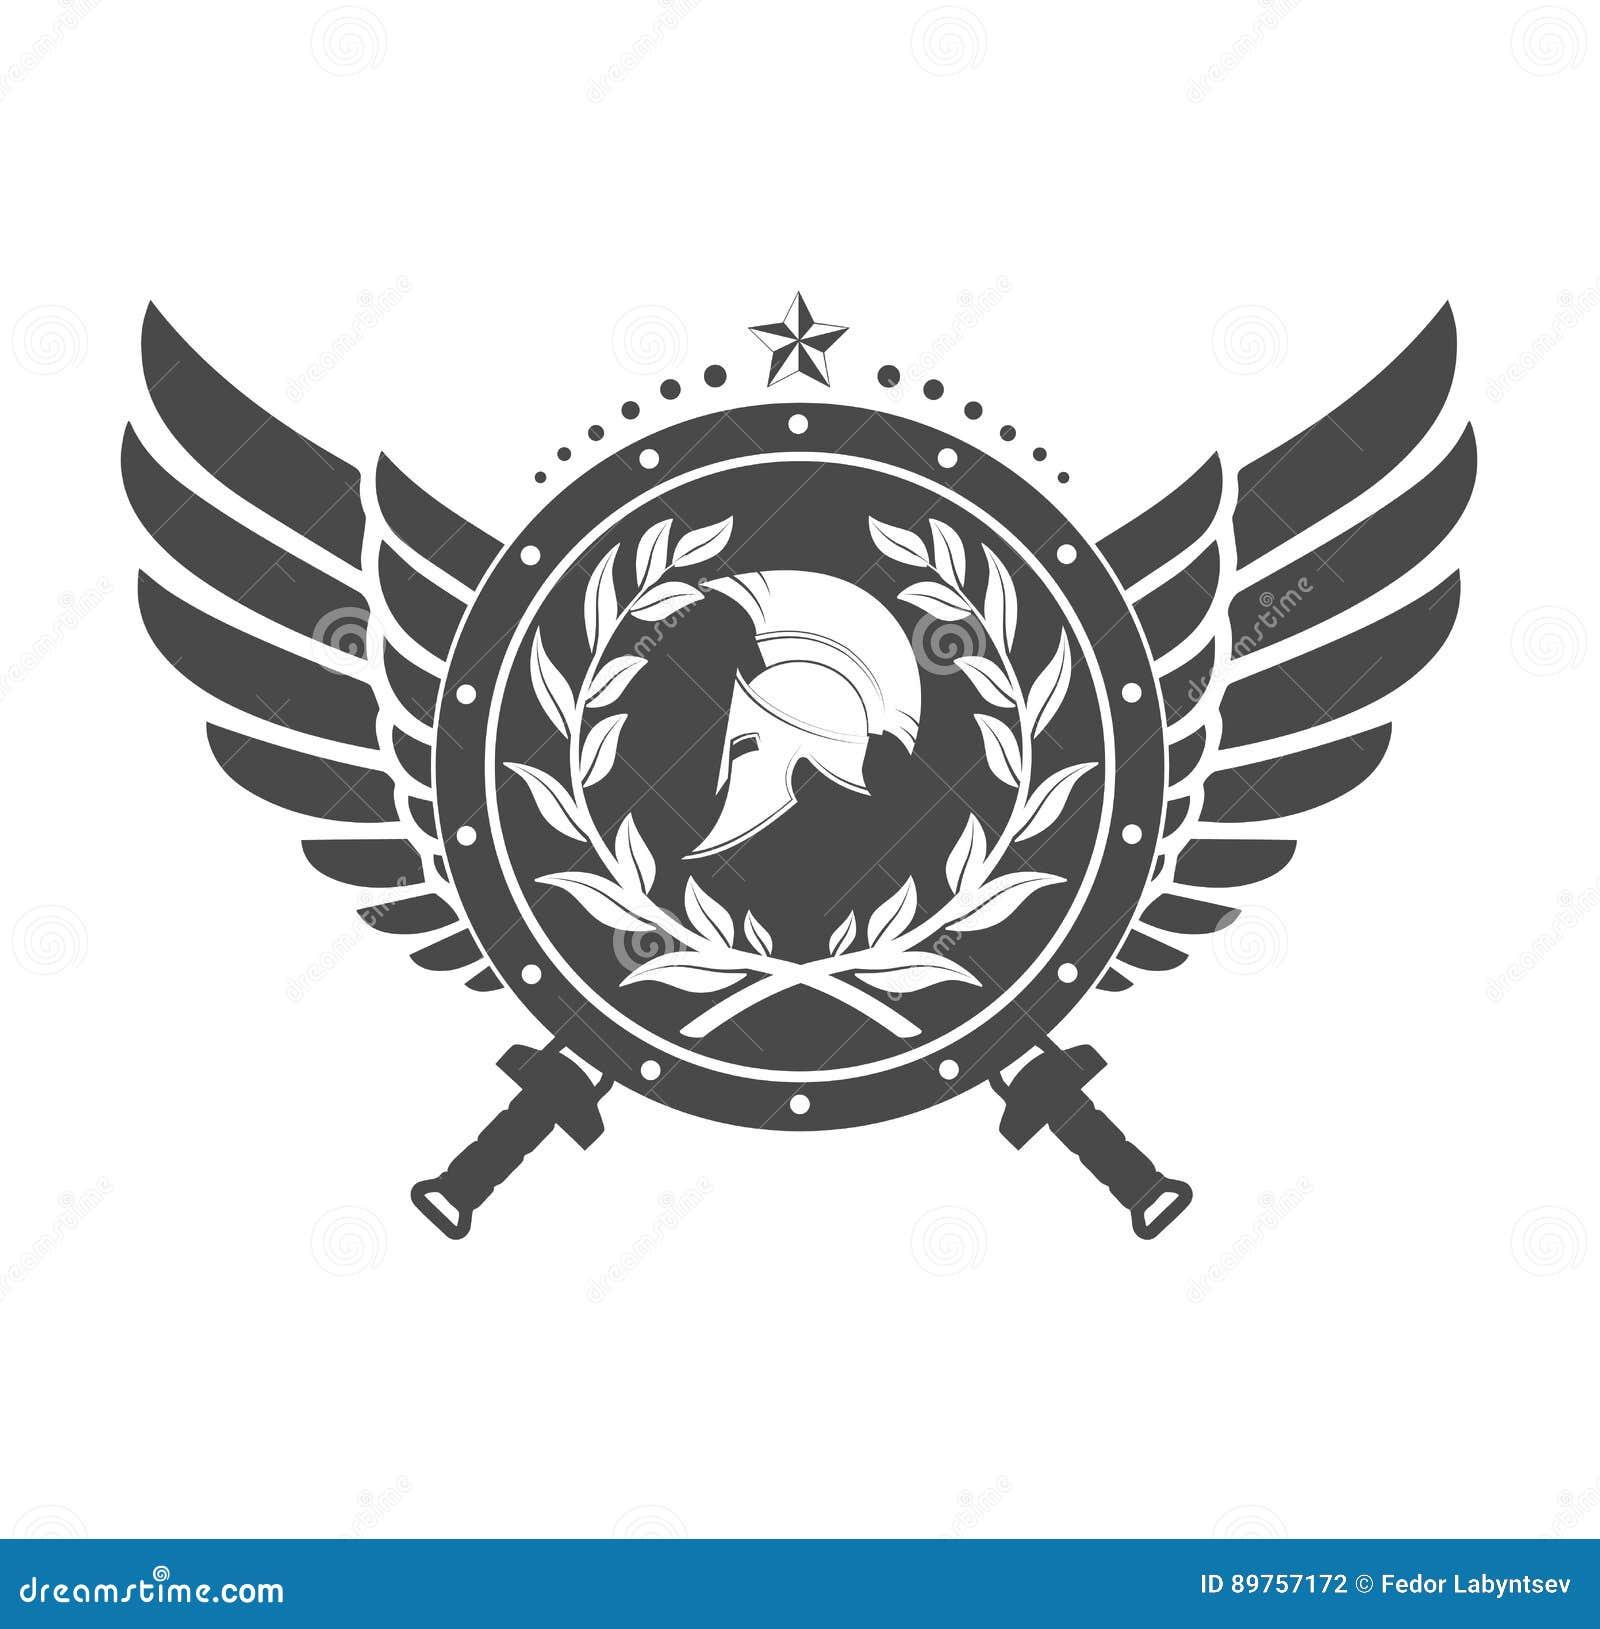 Militair symbool een Spartaanse helm op een raad met onder vleugels